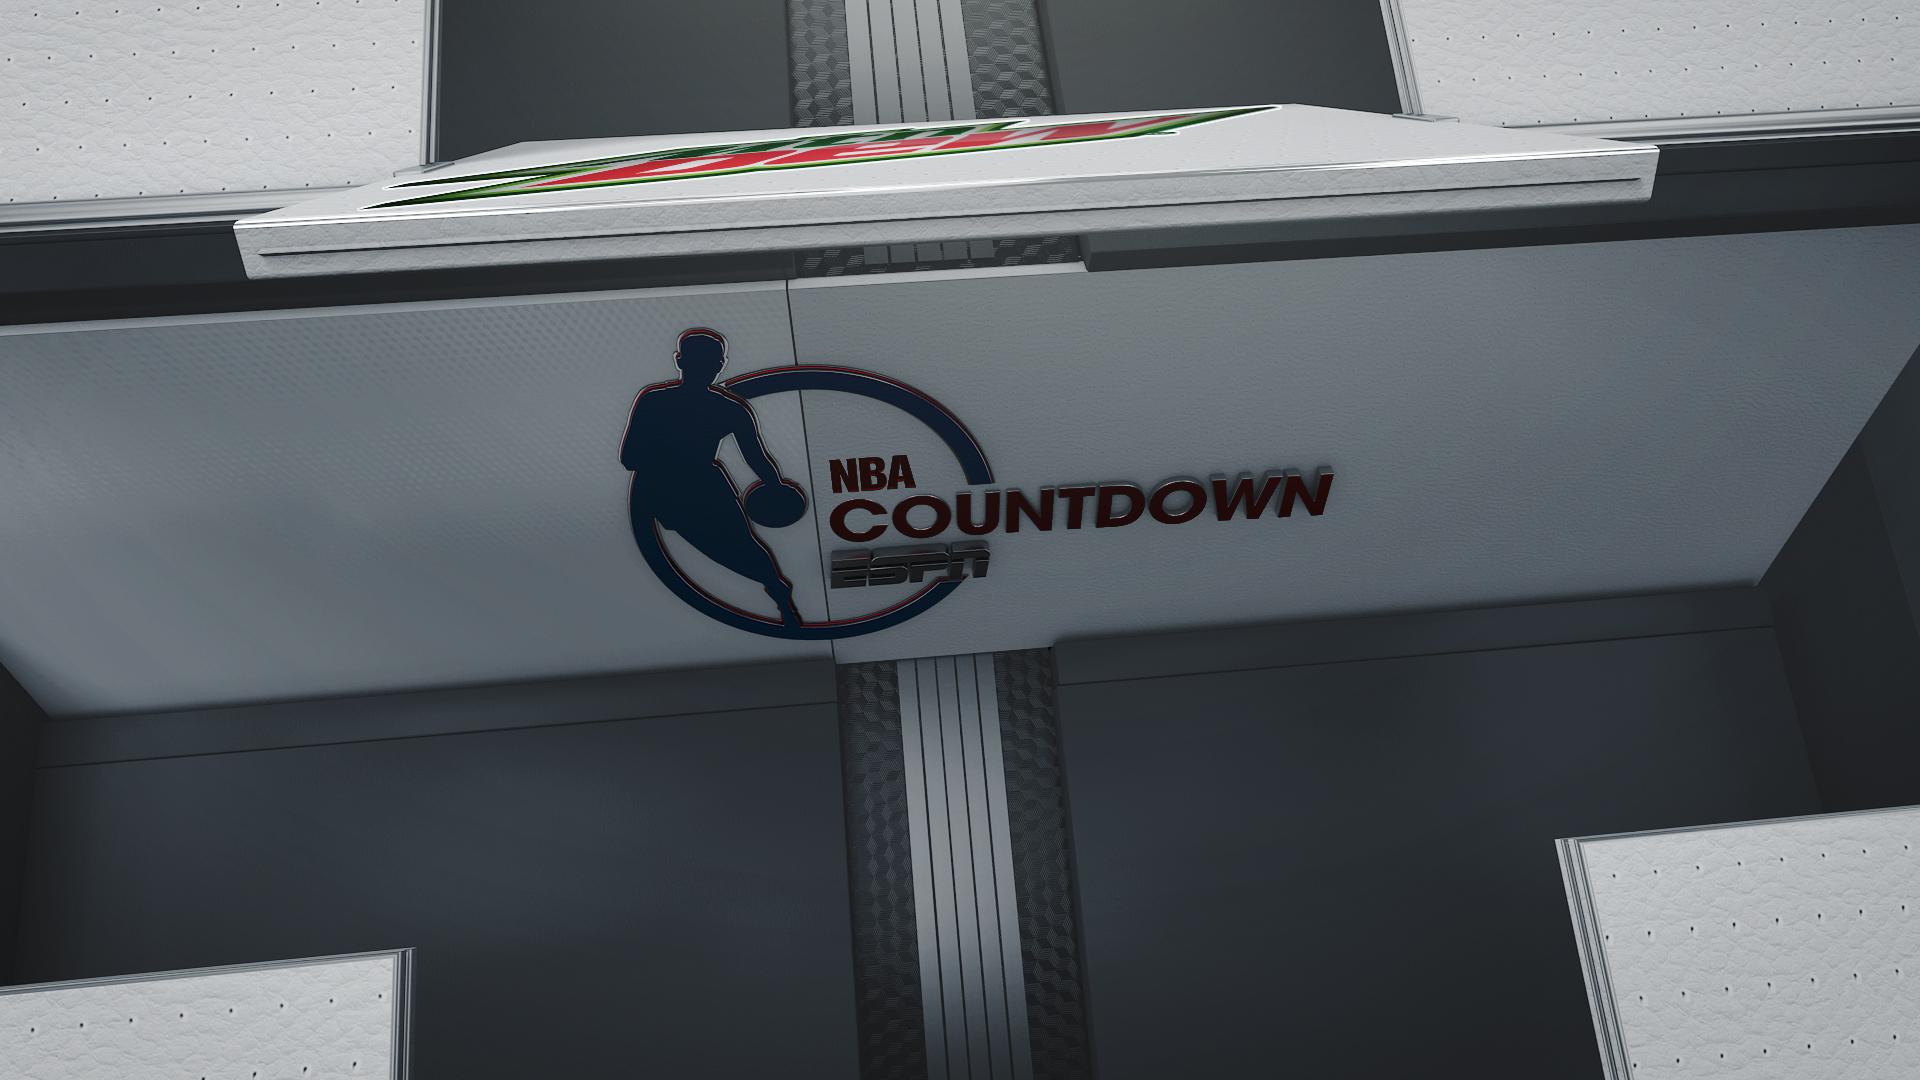 COUNTDOWN_OPEN_06.jpg